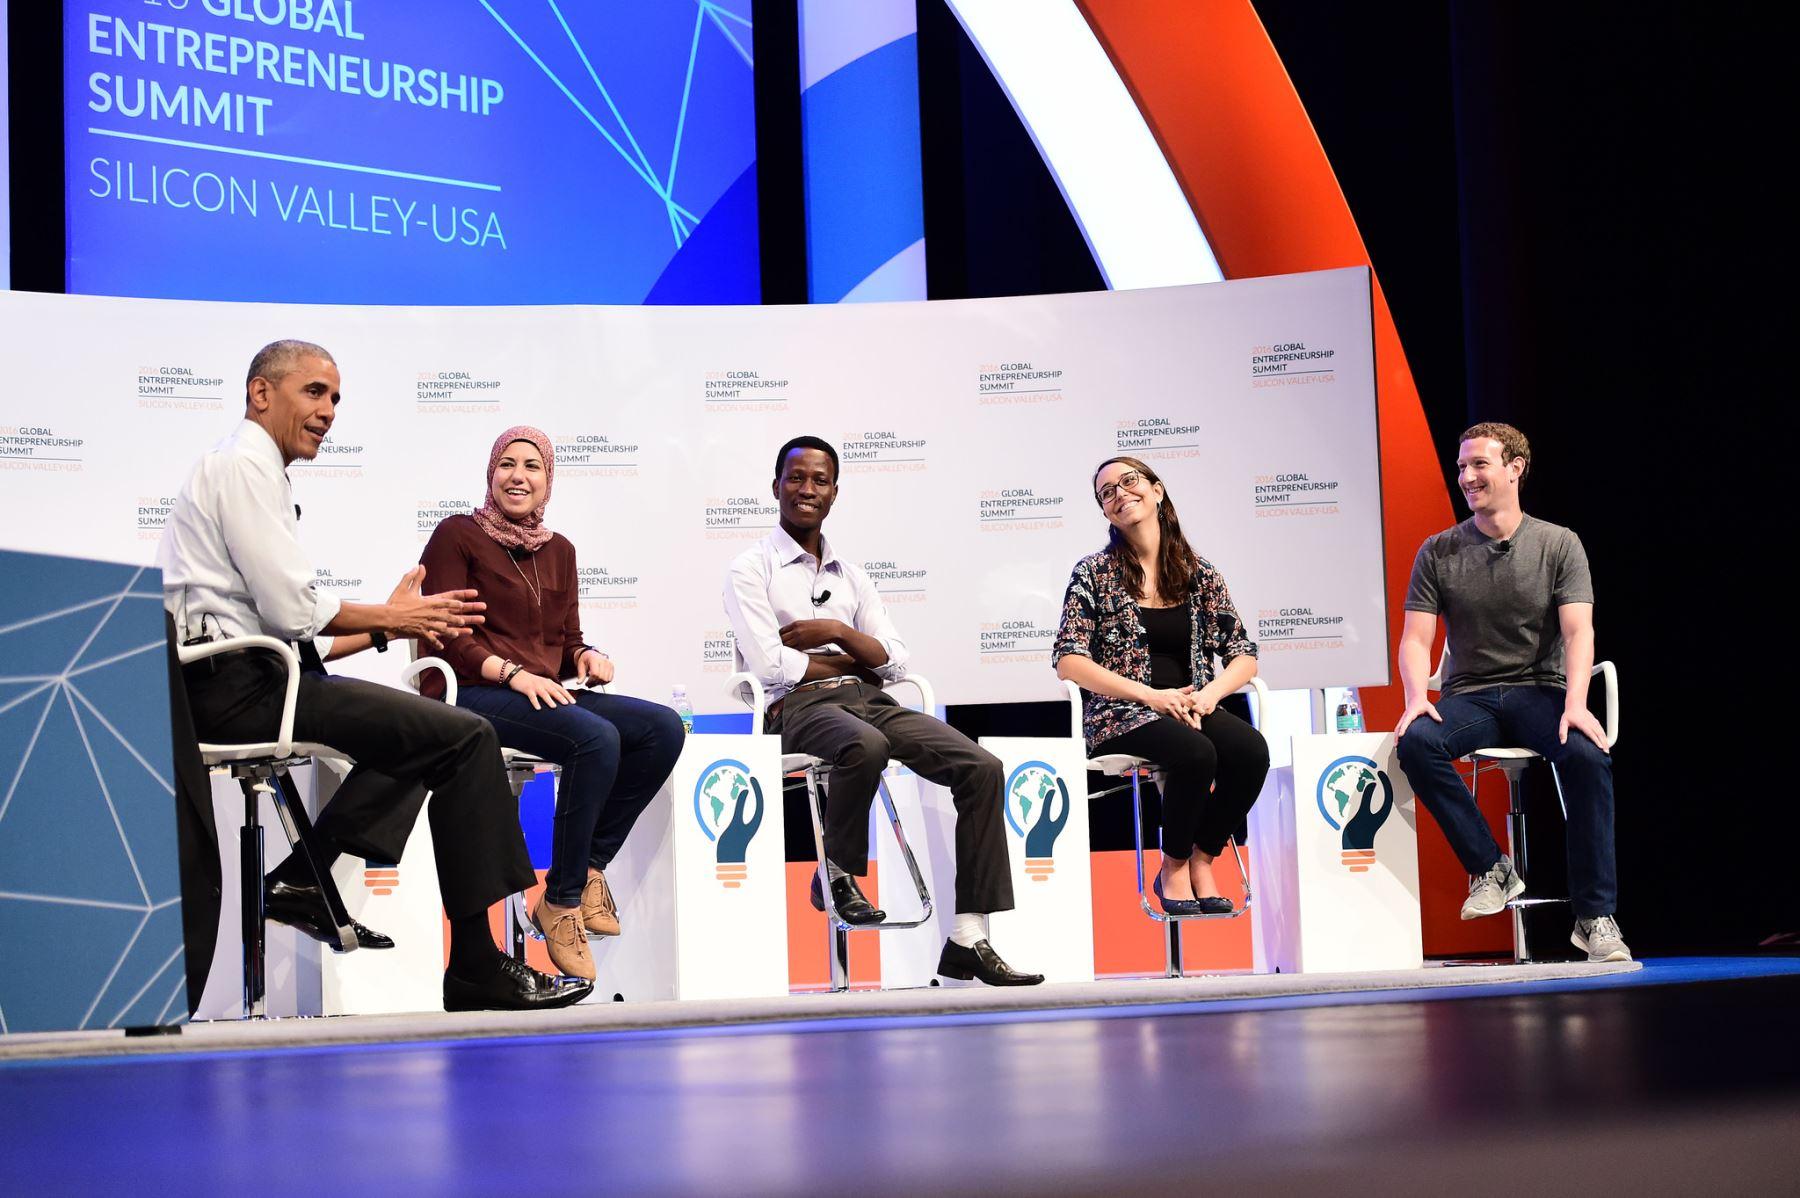 Peruana Mariana Costa conversó con presidente Barack Obama y Mark Zuckerberg. Foto. Cumbre Mundial de Emprendedores 2016.